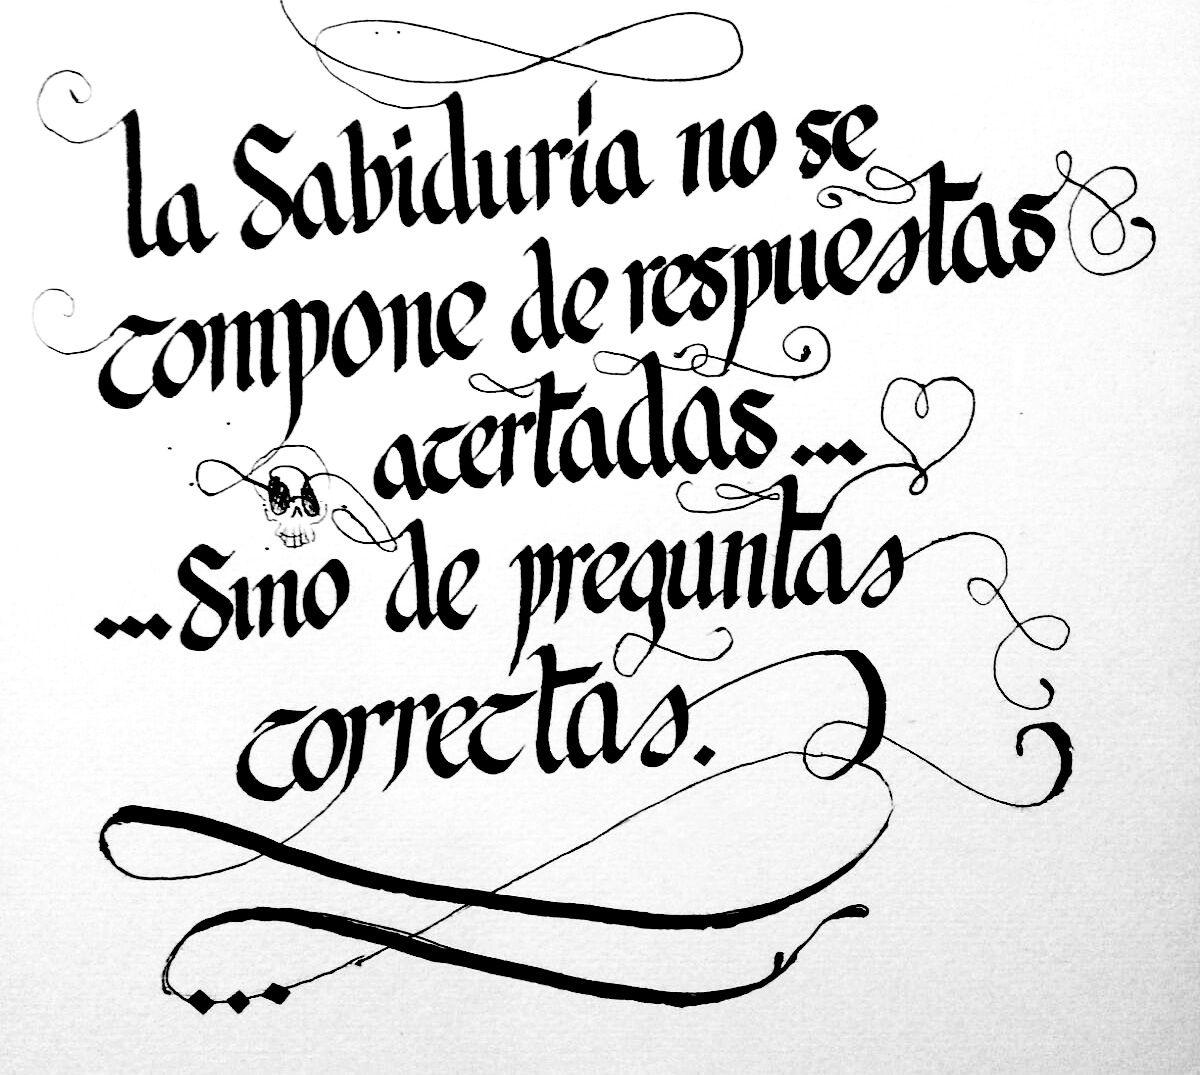 Caligrafía. frases motivadoras #366 #caligraffiti #caligrafia #frase #motivacion #arte #preguntas #respuestas